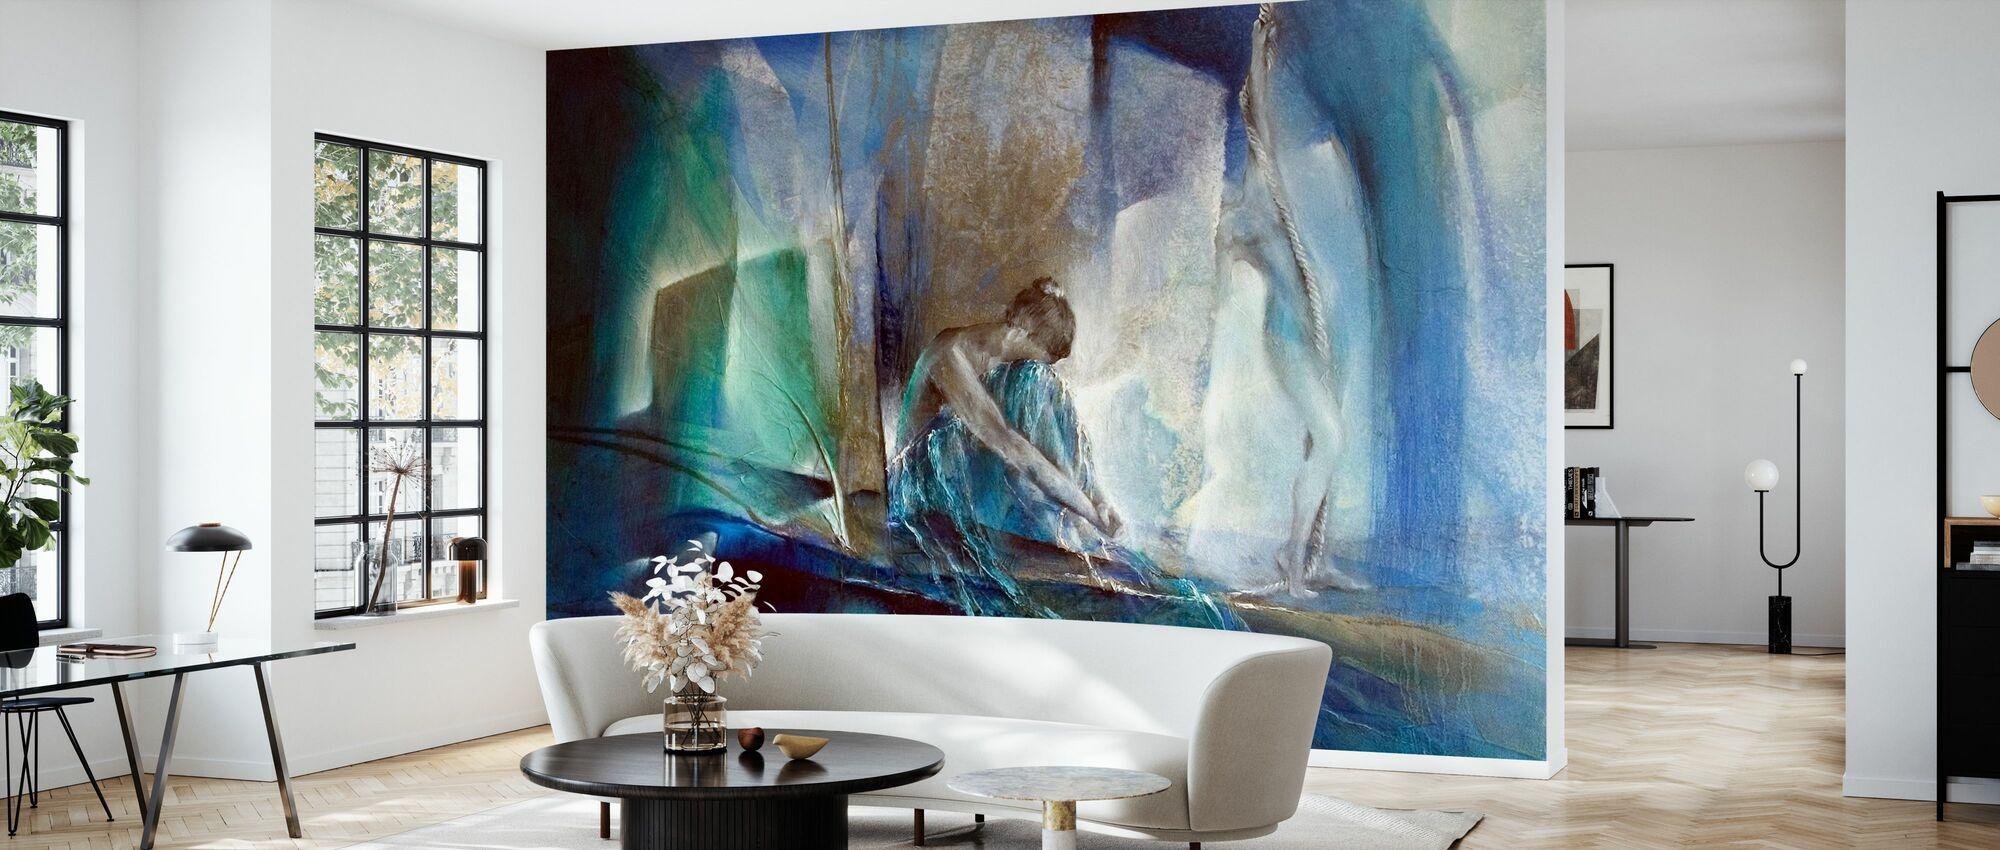 Blue Room - Wallpaper - Living Room